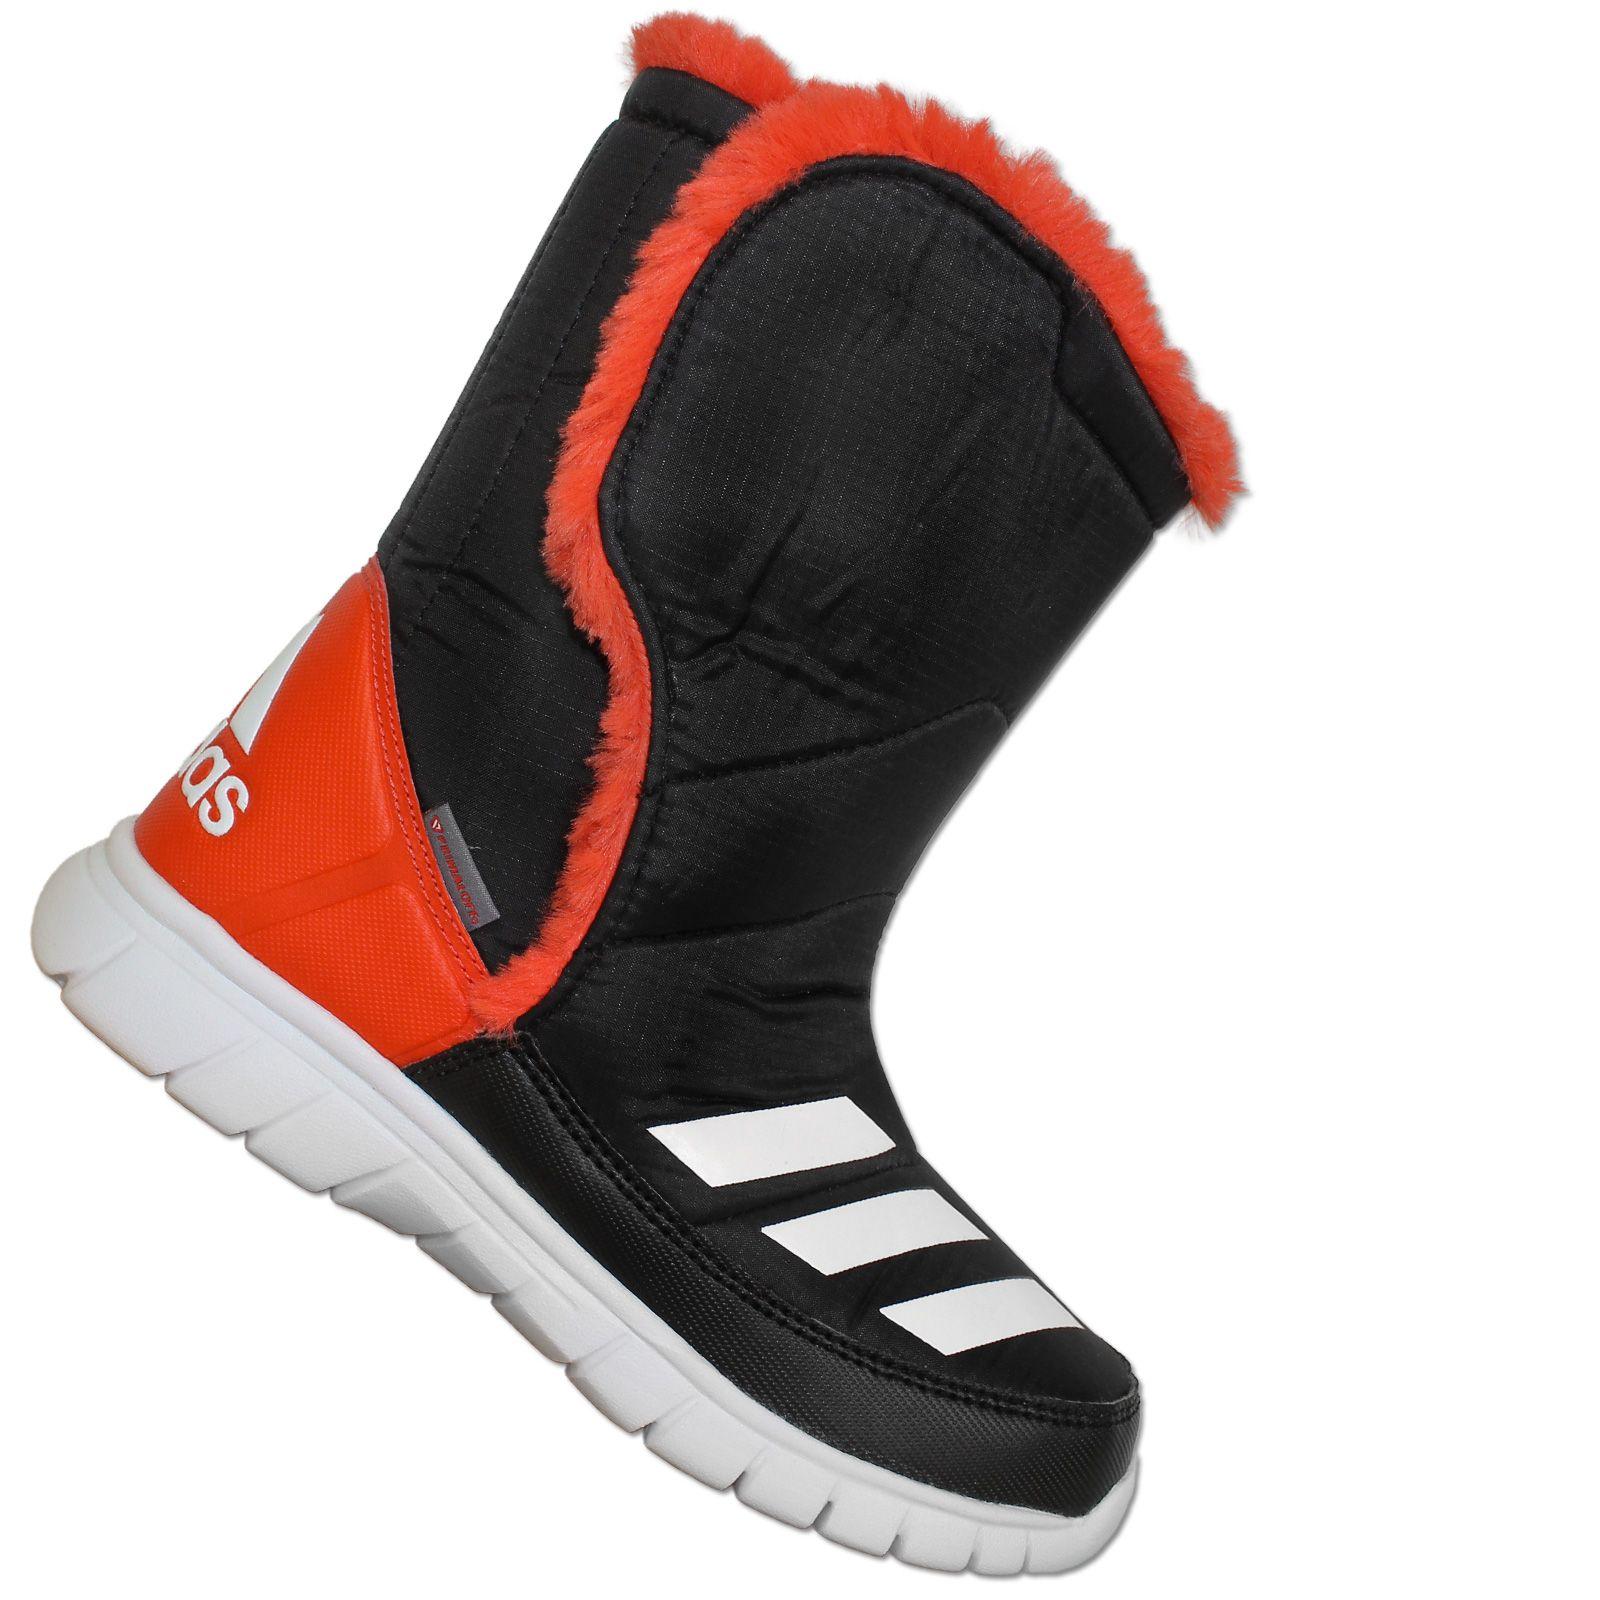 Sneaker Mit Fell. neu adidas sneaker stiefel boots winter